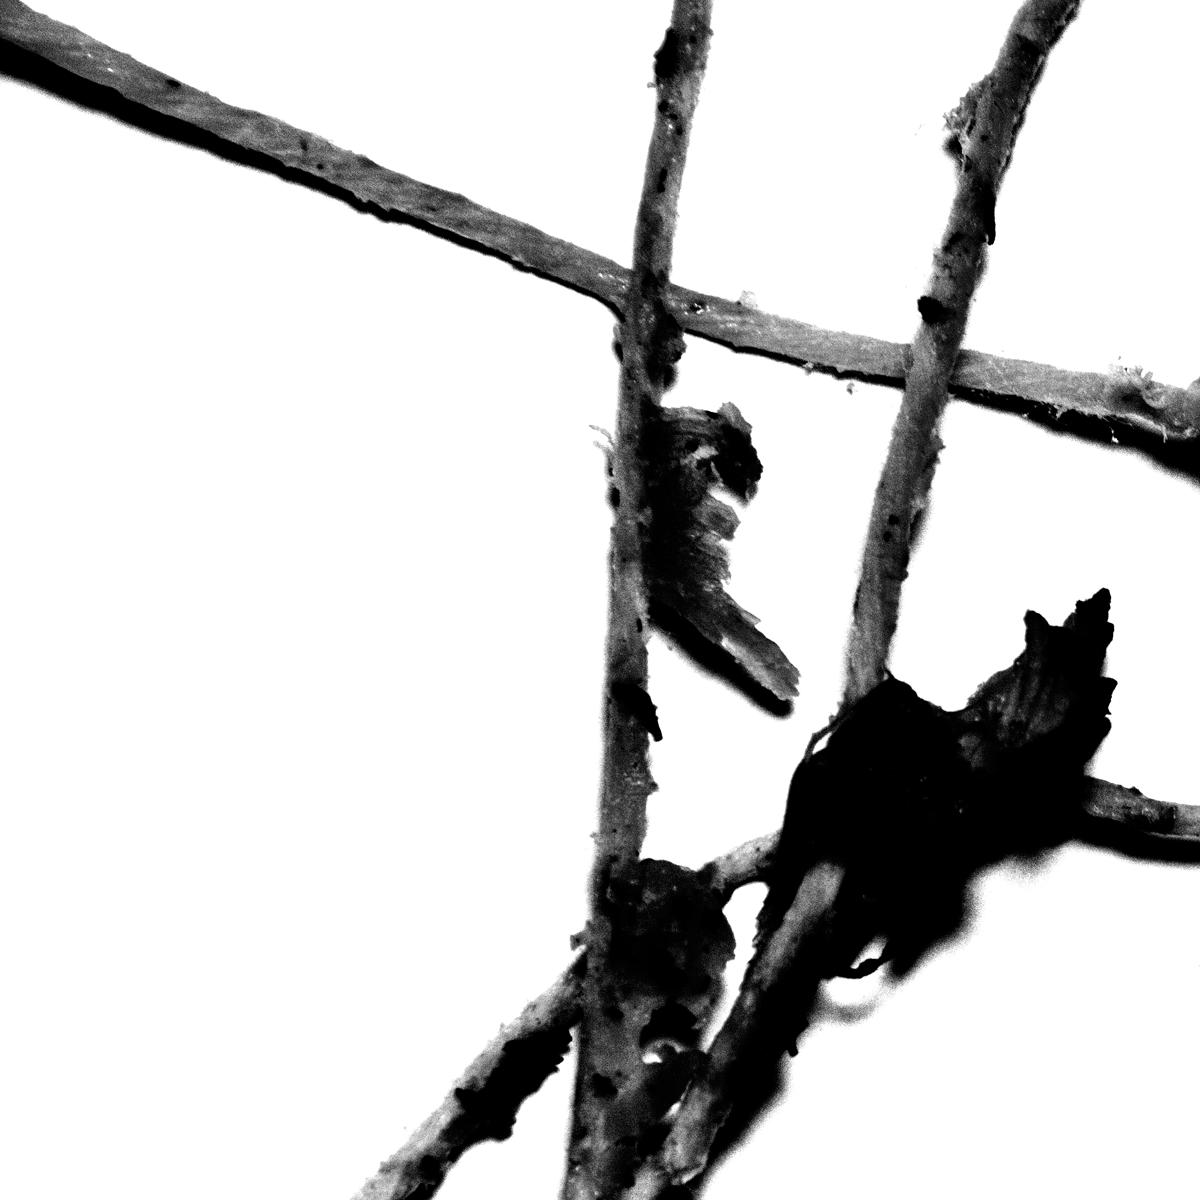 Untitled (strings #4), 2013